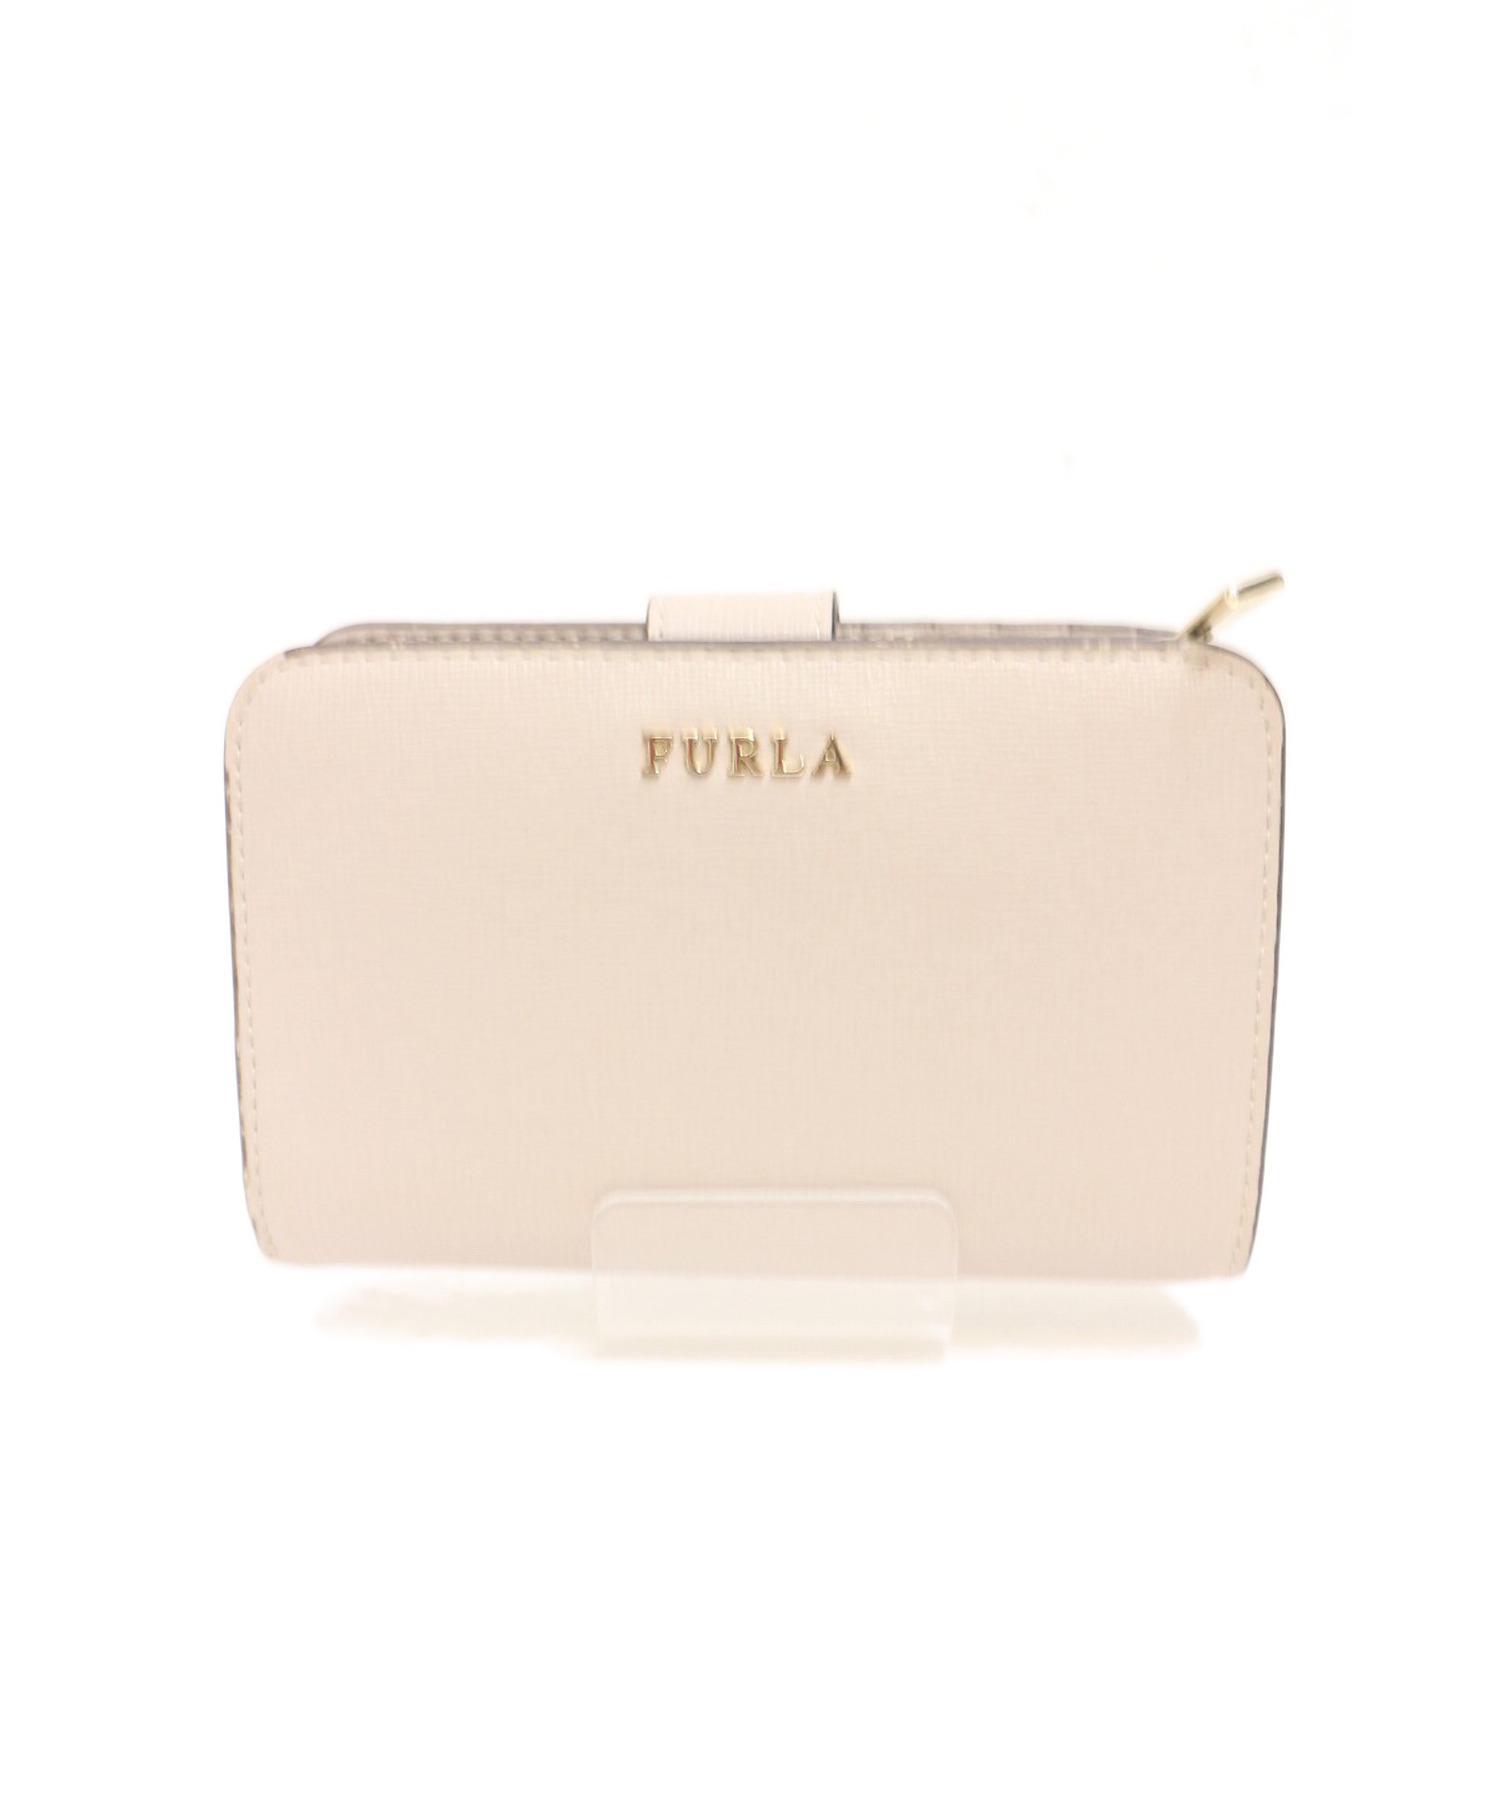 cheaper 544ce d9219 [中古]FURLA(フルラ)のレディース 服飾小物 2つ折り財布